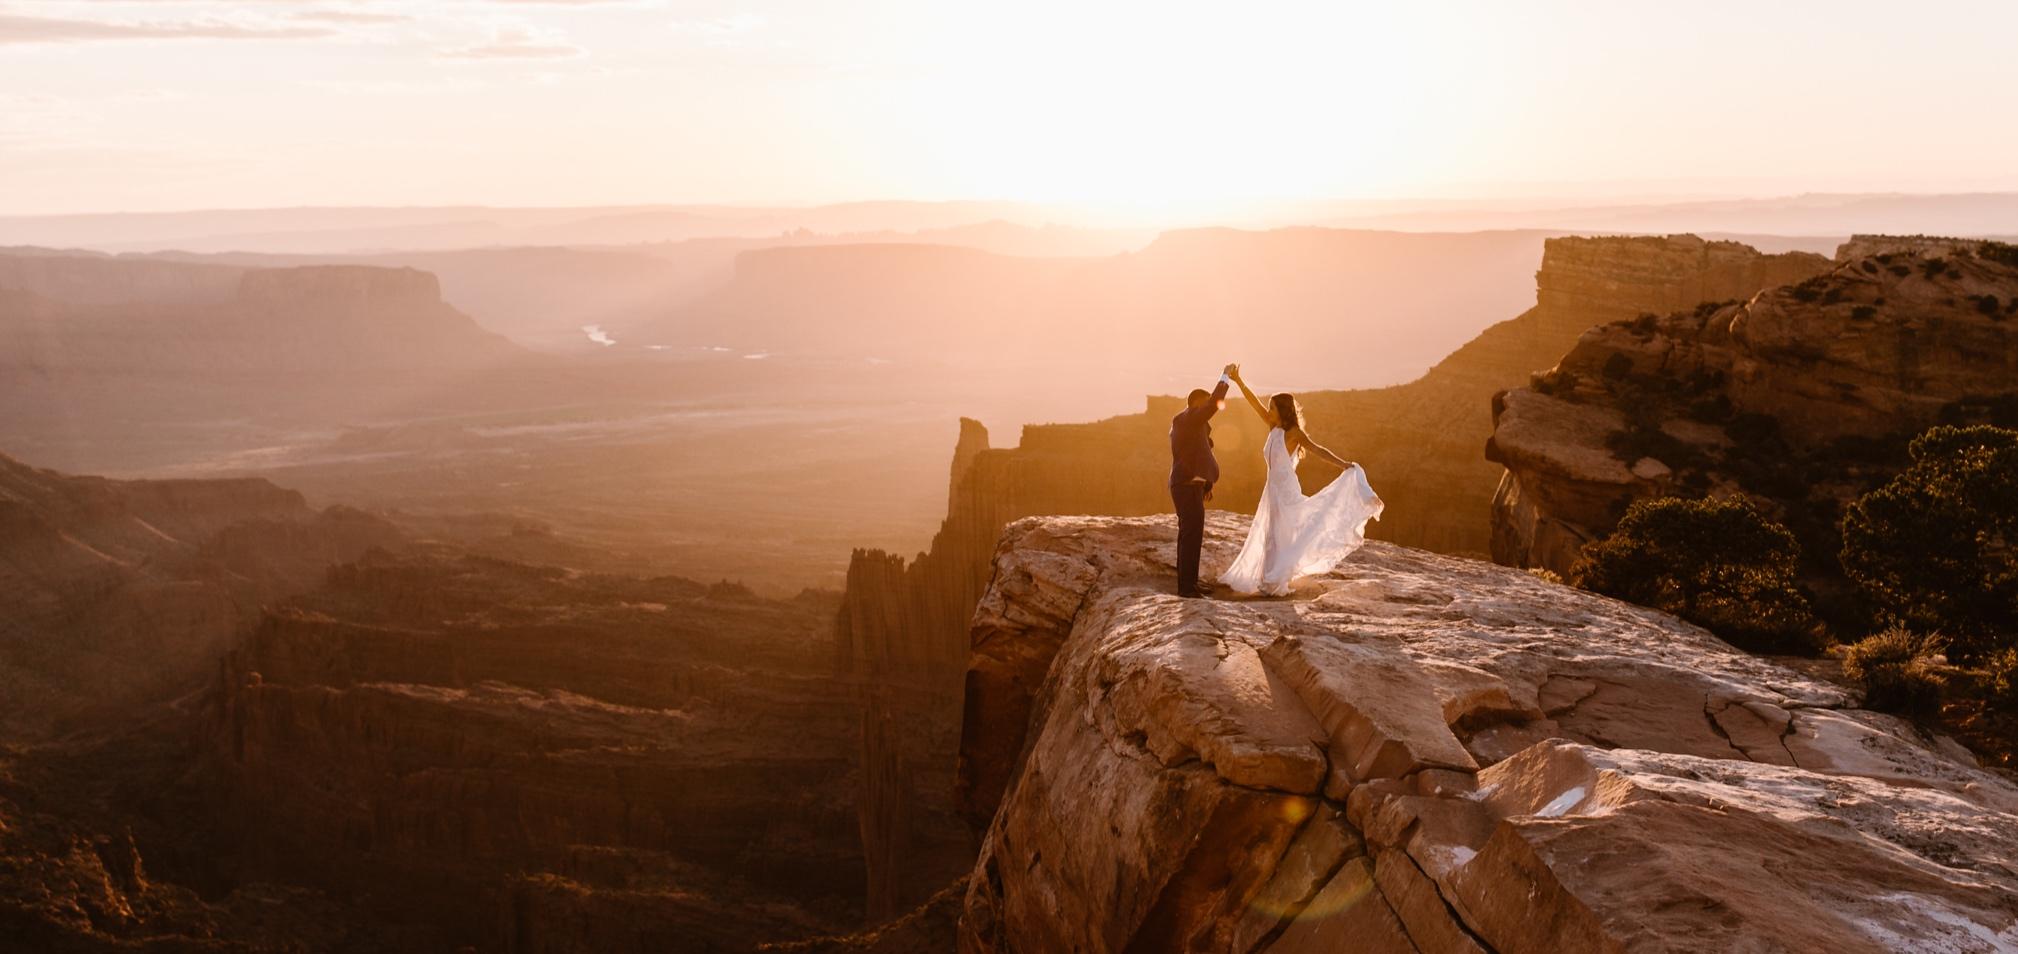 Hearnes-Elopement-Photography-Moab-Adventure-Jeep-Wedding-Photographer-9.jpg